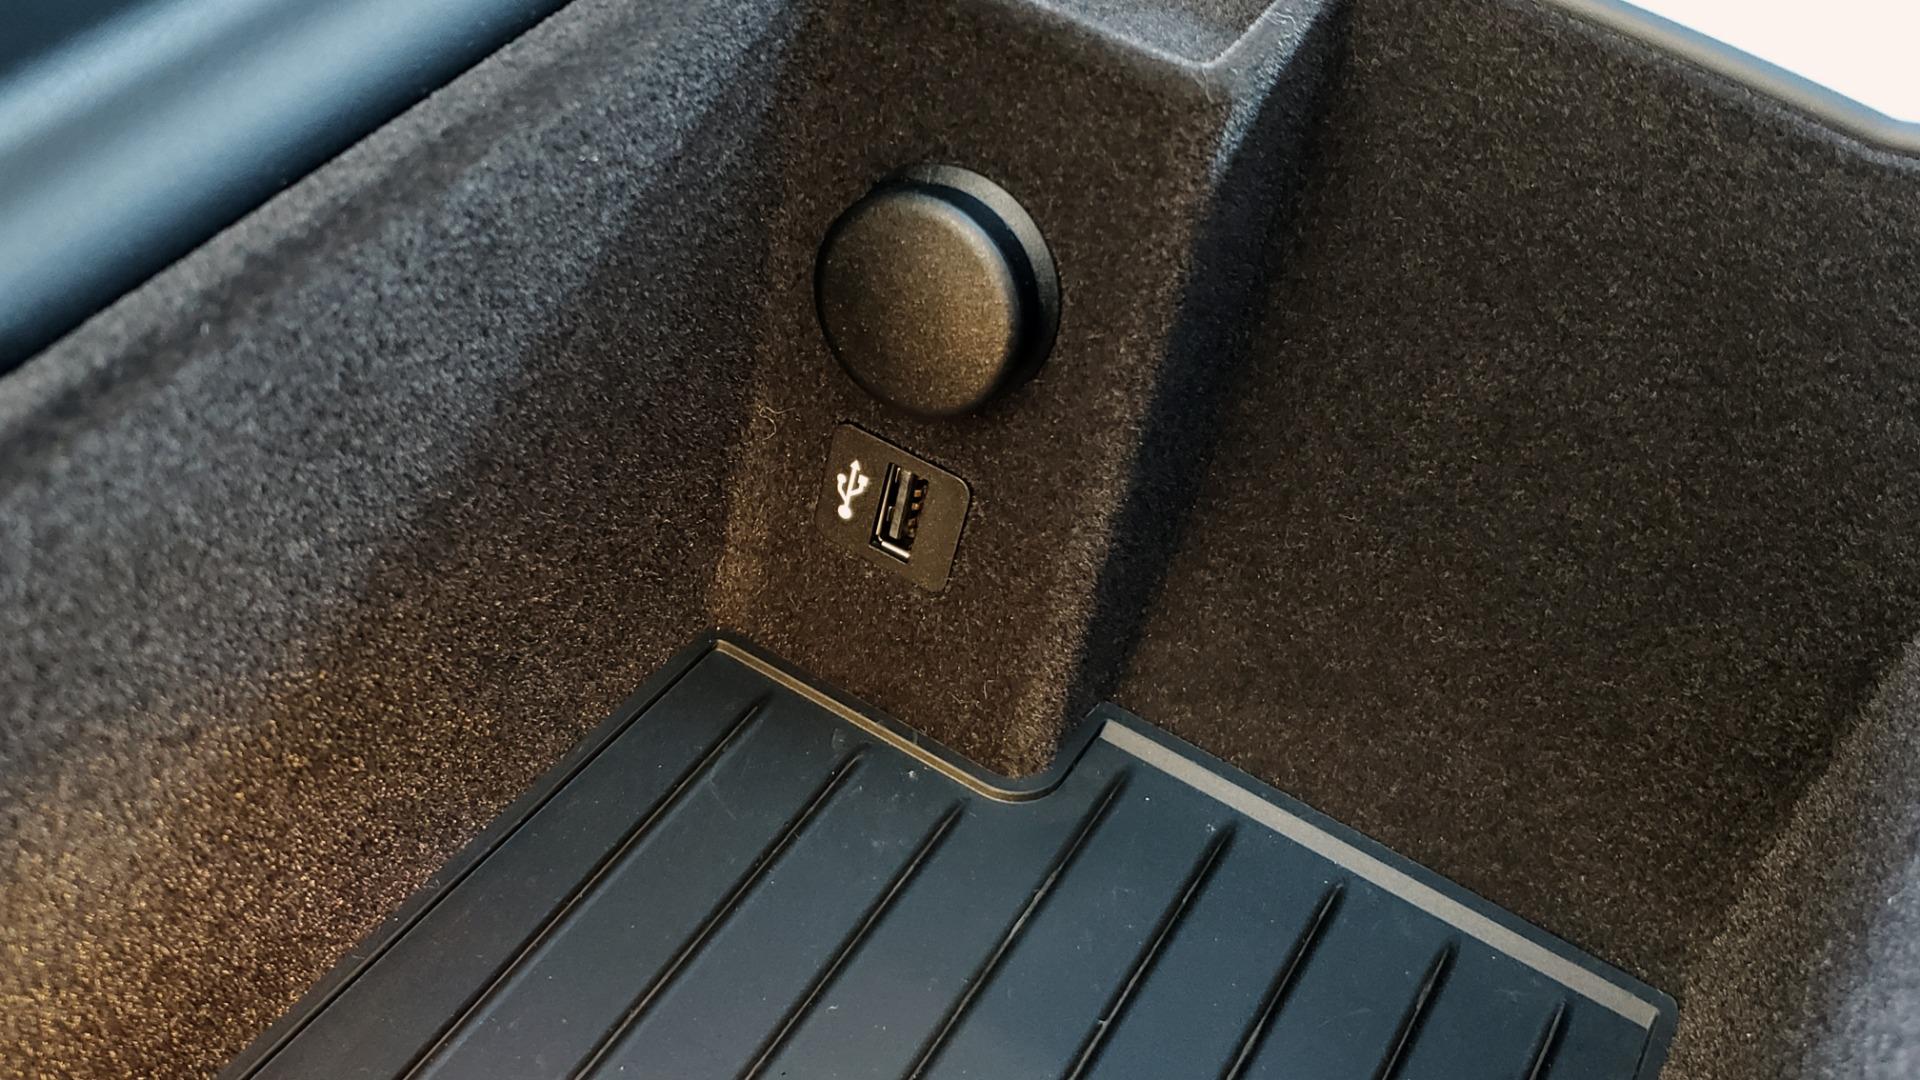 Used 2018 BMW 5 SERIES 540I M-SPORT / DRVR ASST / EXEC PKG / NAV / SUNROOF / HUD / REARVIEW for sale Sold at Formula Imports in Charlotte NC 28227 59